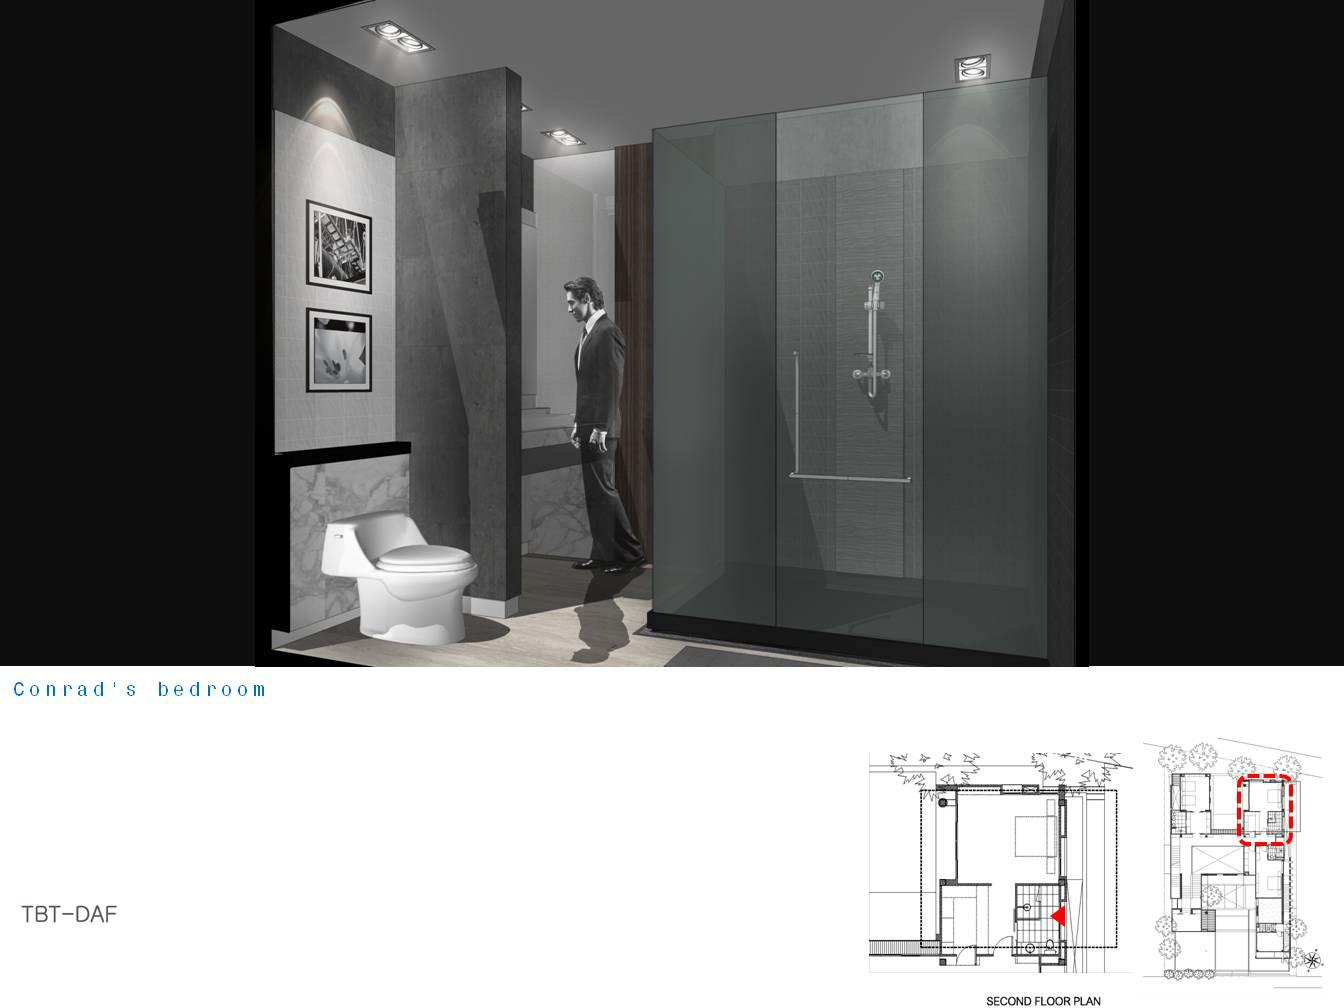 TBT-DAF interior design house robinson 19